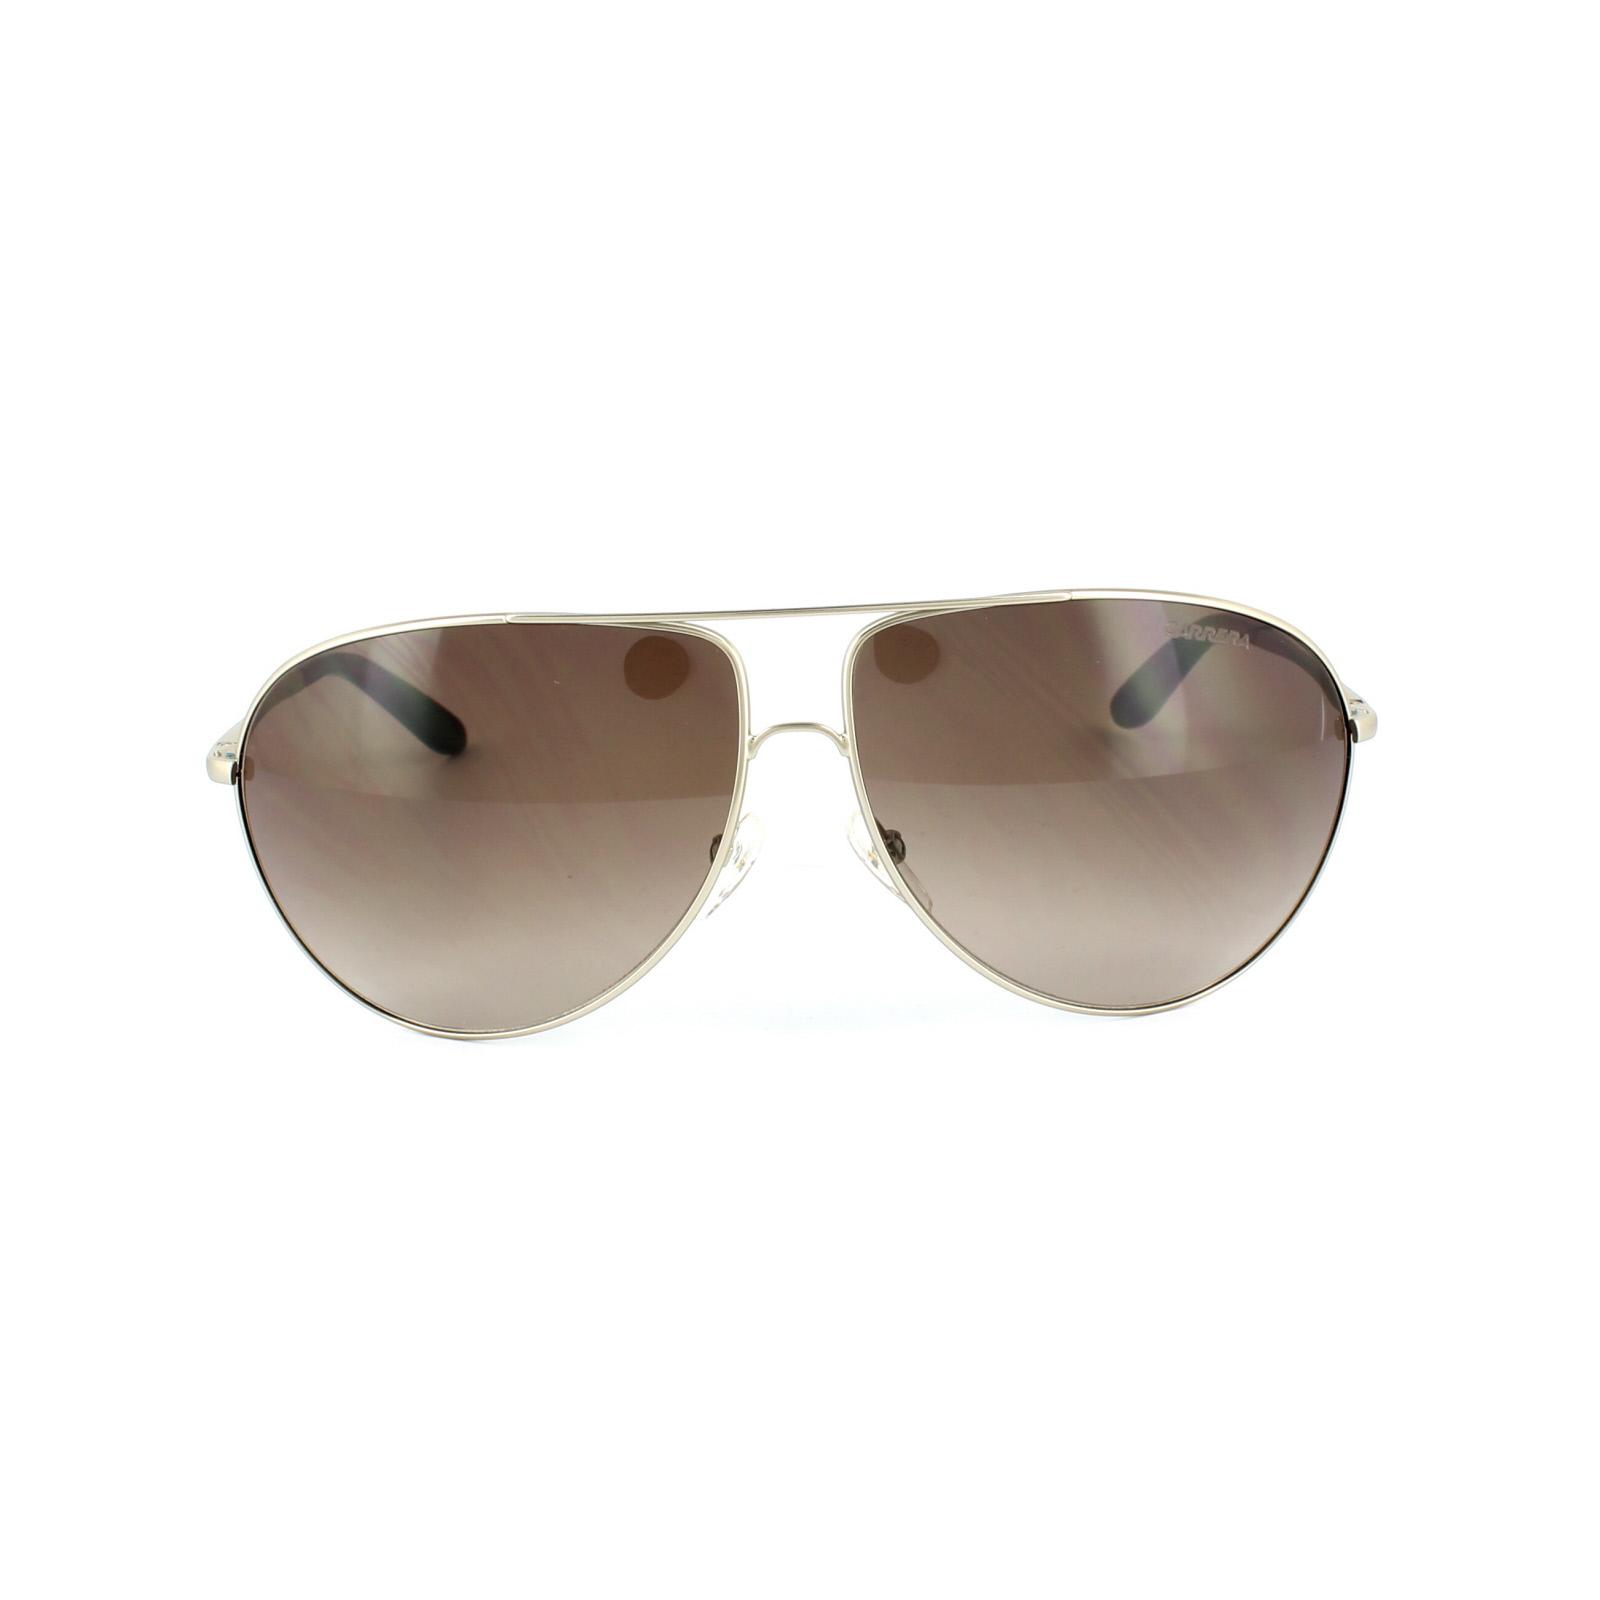 Carrera Sunglasses Gipsy  carrera new gipsy sunglasses ed sunglasses